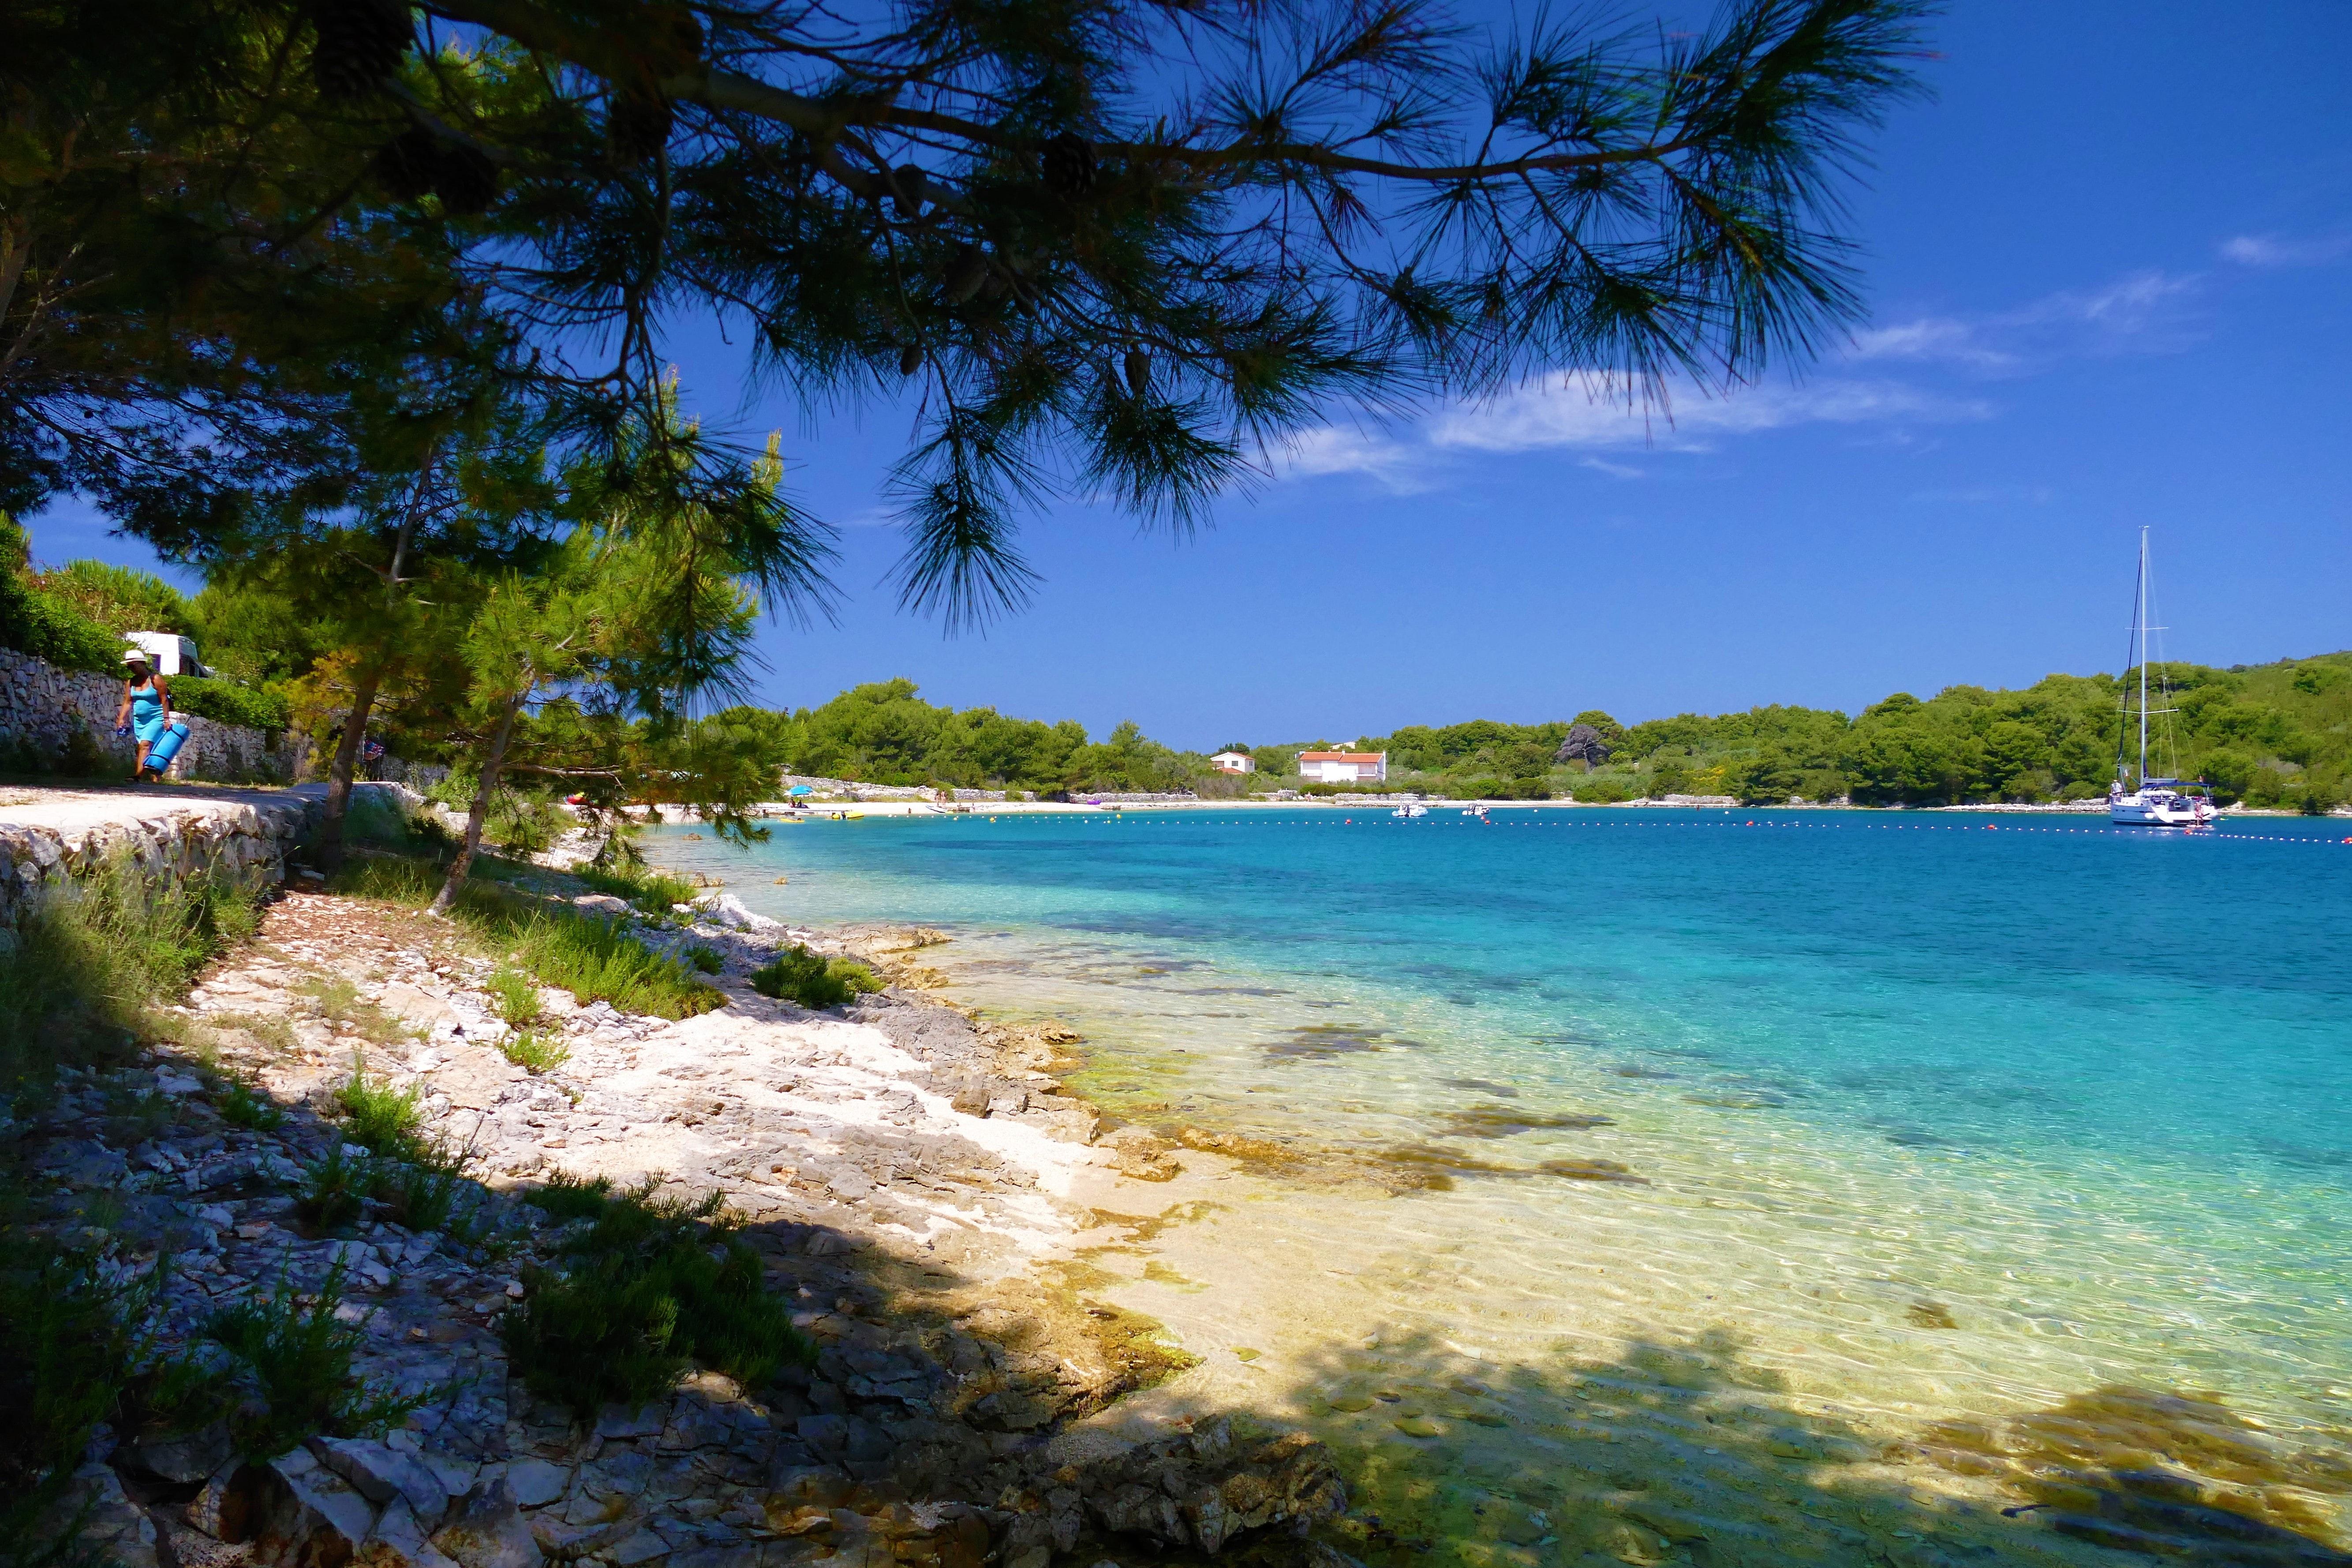 5 Best Things to do in Dugi Otok, Croatia